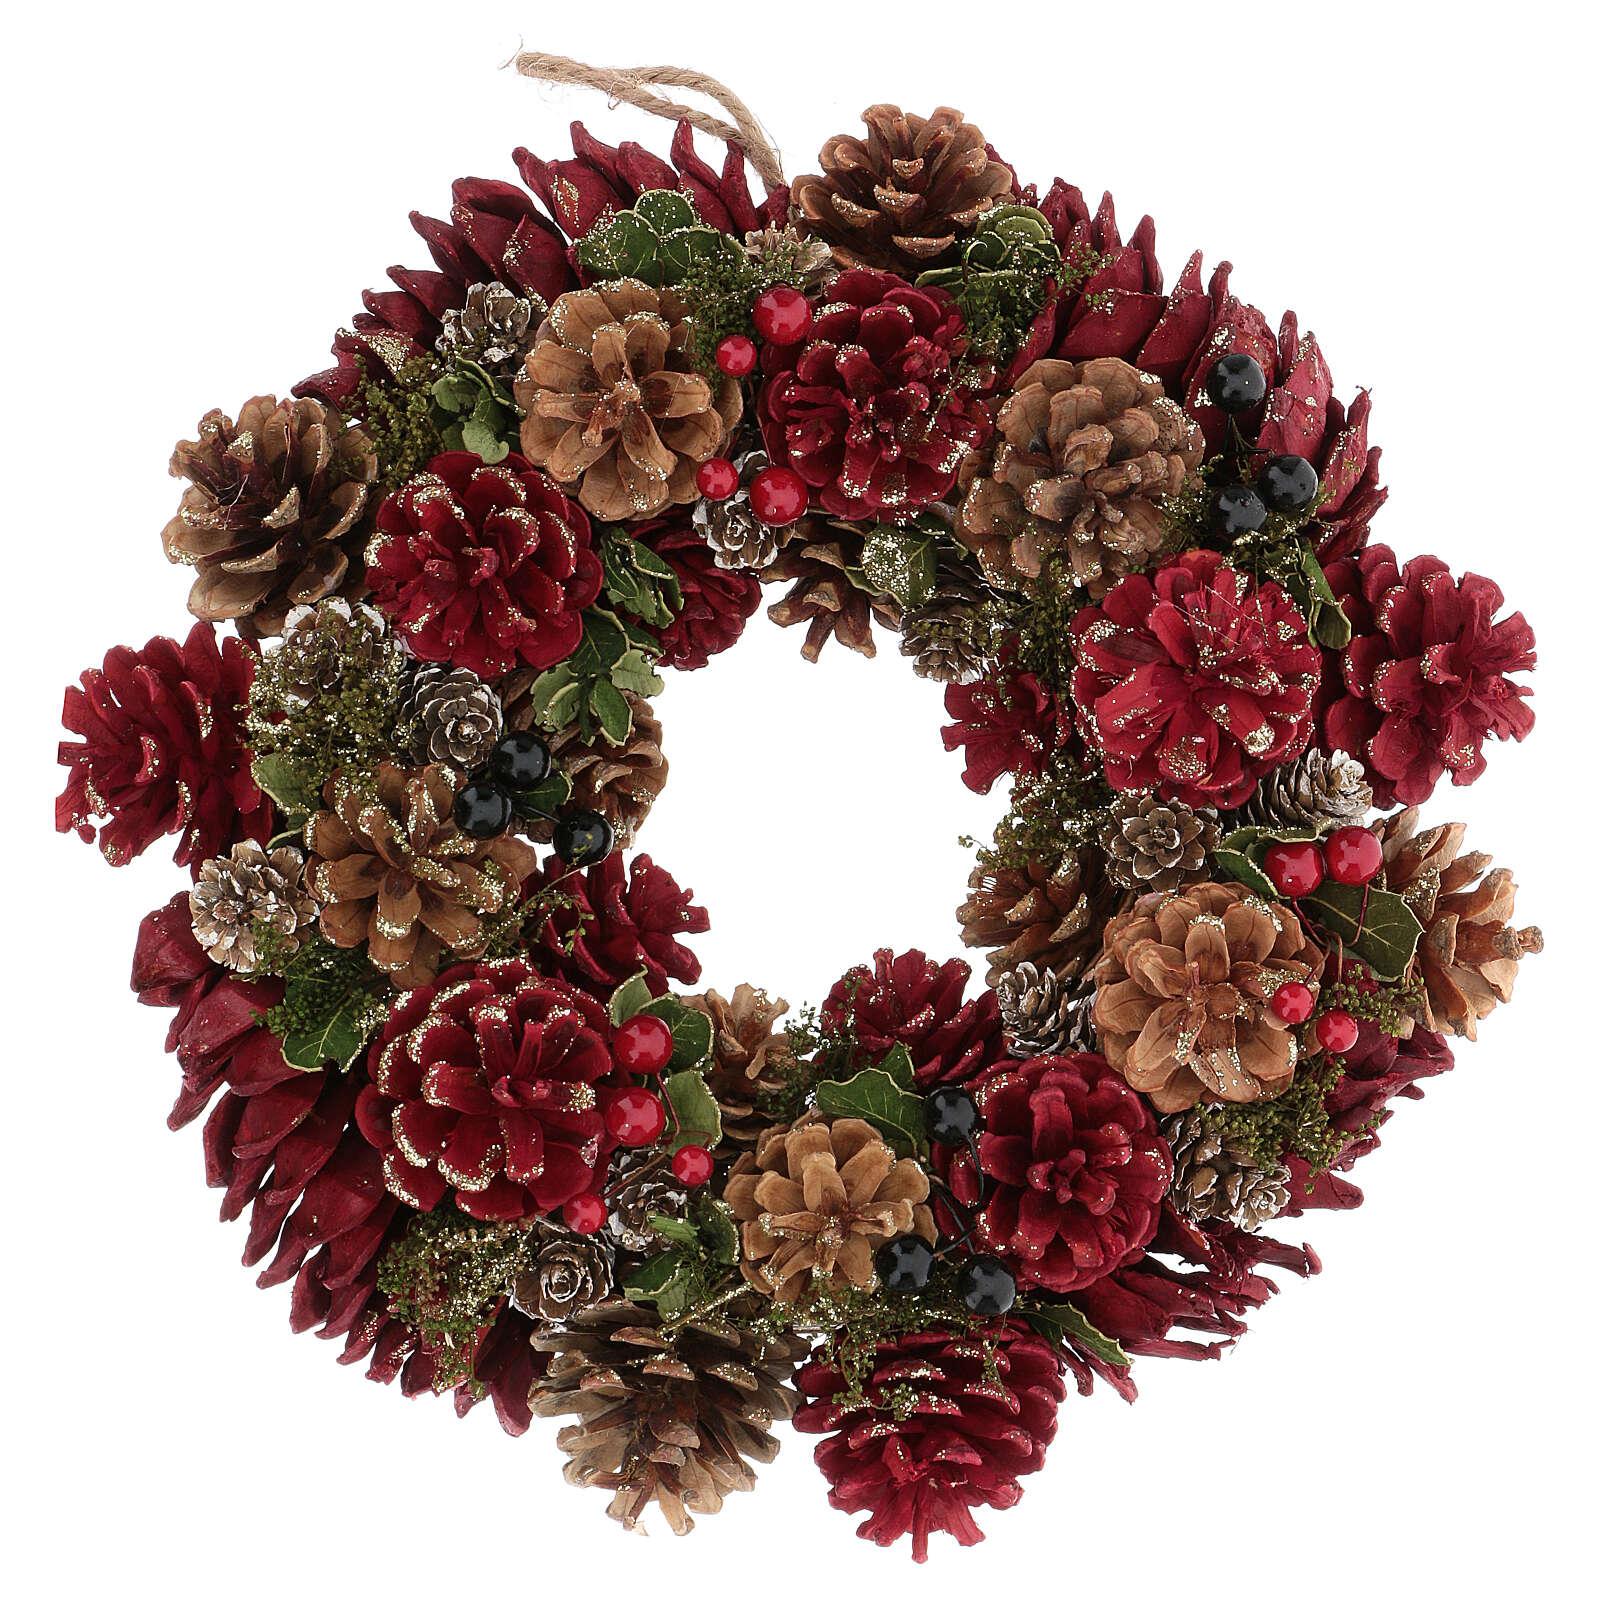 Advent wreath red glitter gold pine cones berries 30 cm 3